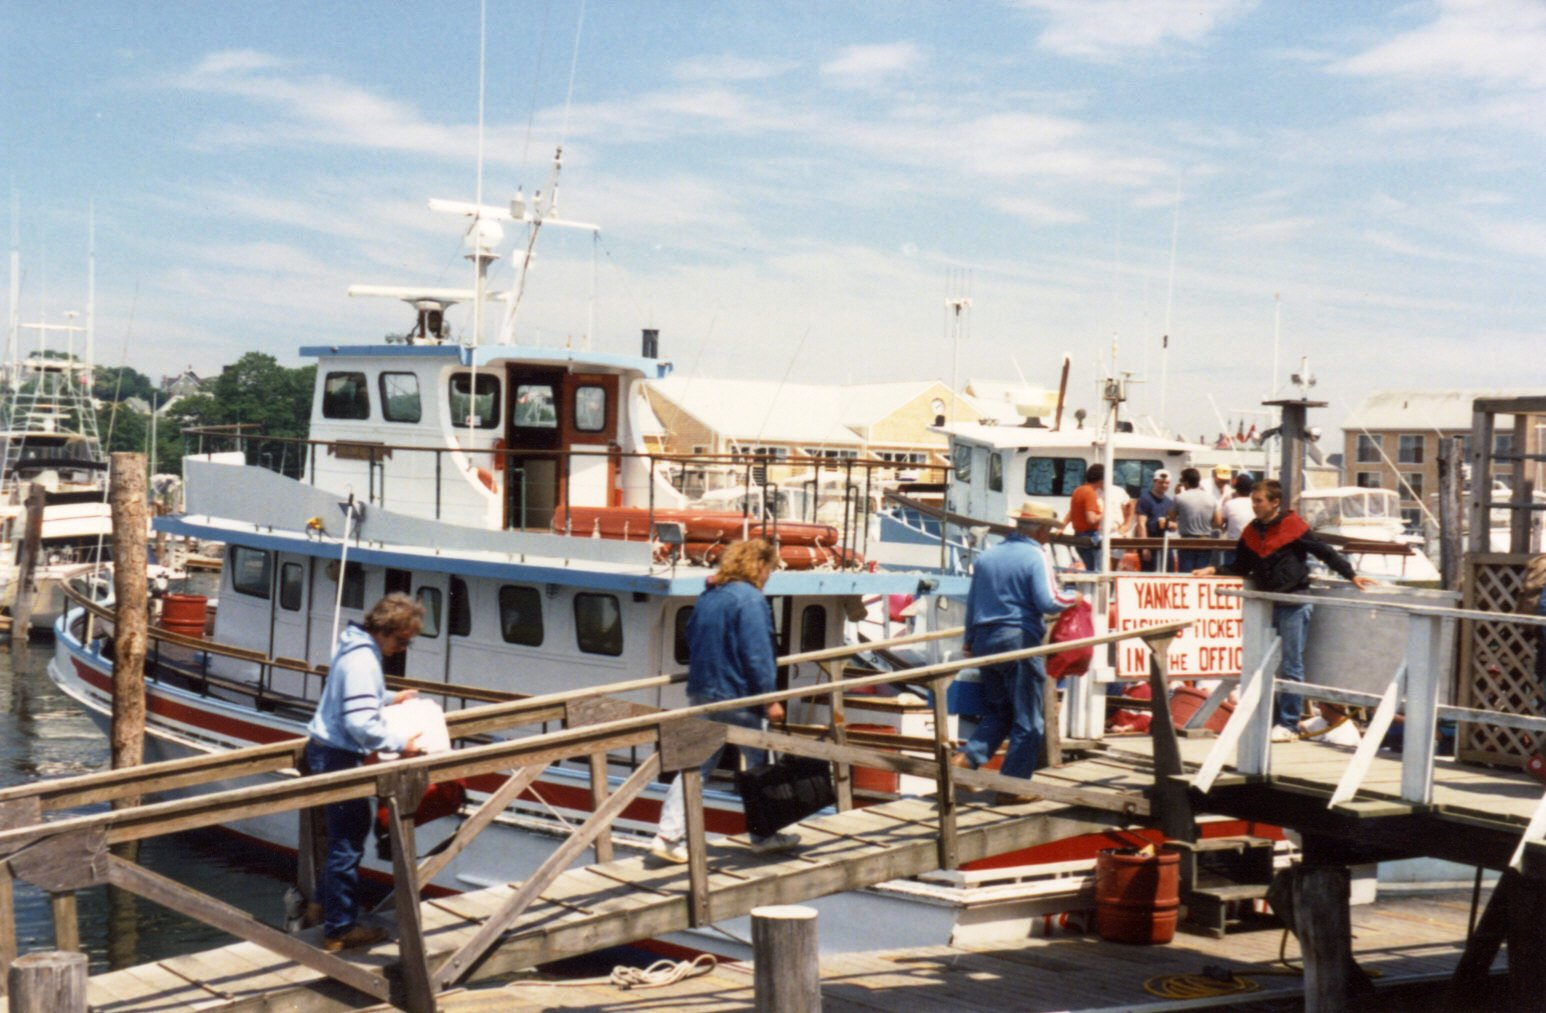 Actionshotsnh deep sea fishing gloucester ma for Deep sea fishing gloucester ma